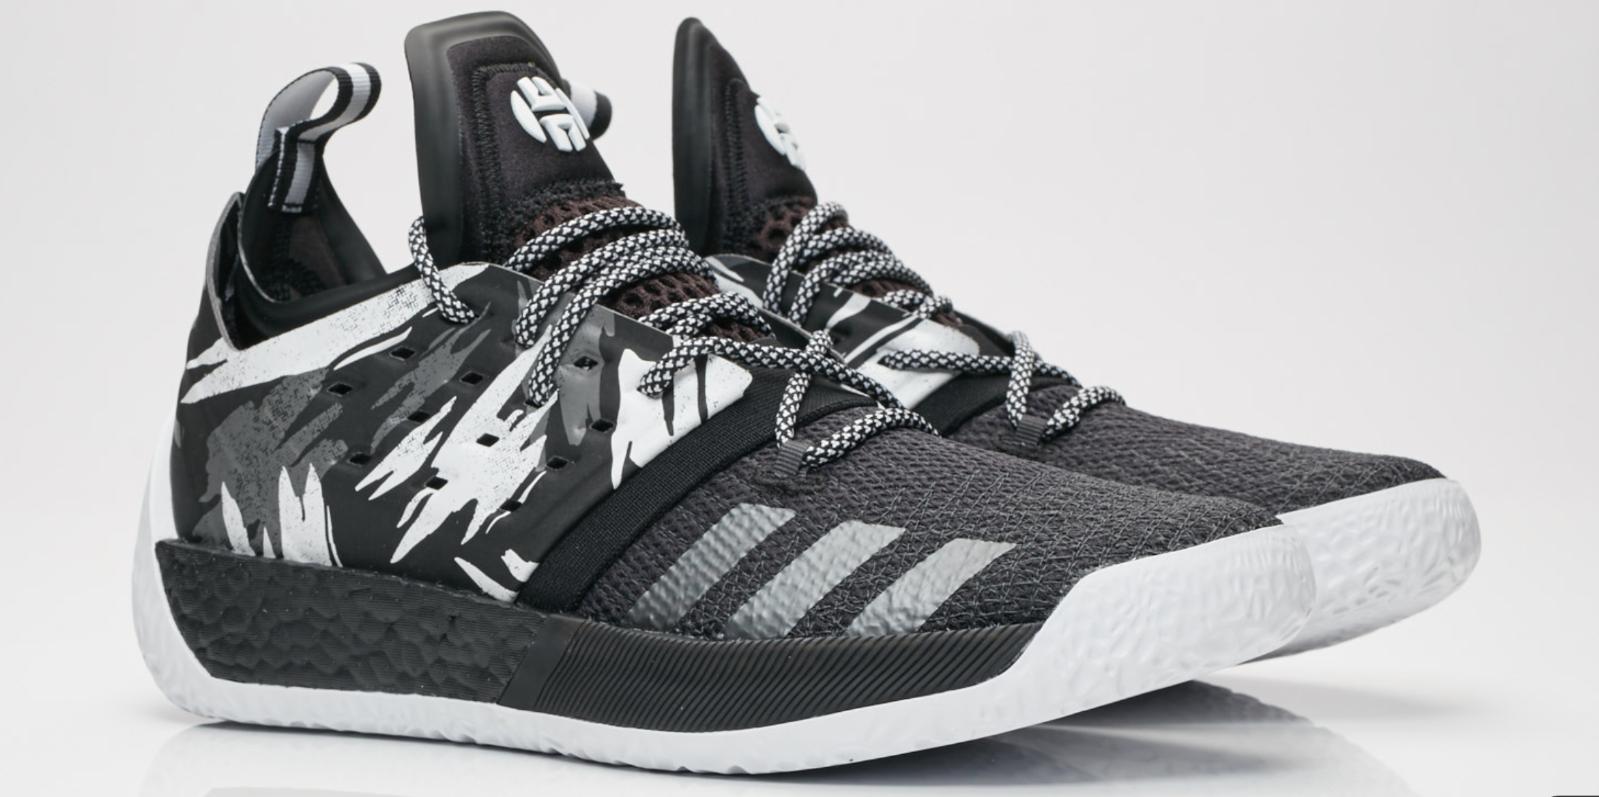 11 NEW  ADIDAS HARDEN VOL. 2 Traffic Jam Black White AH2217 Basketball shoes x1